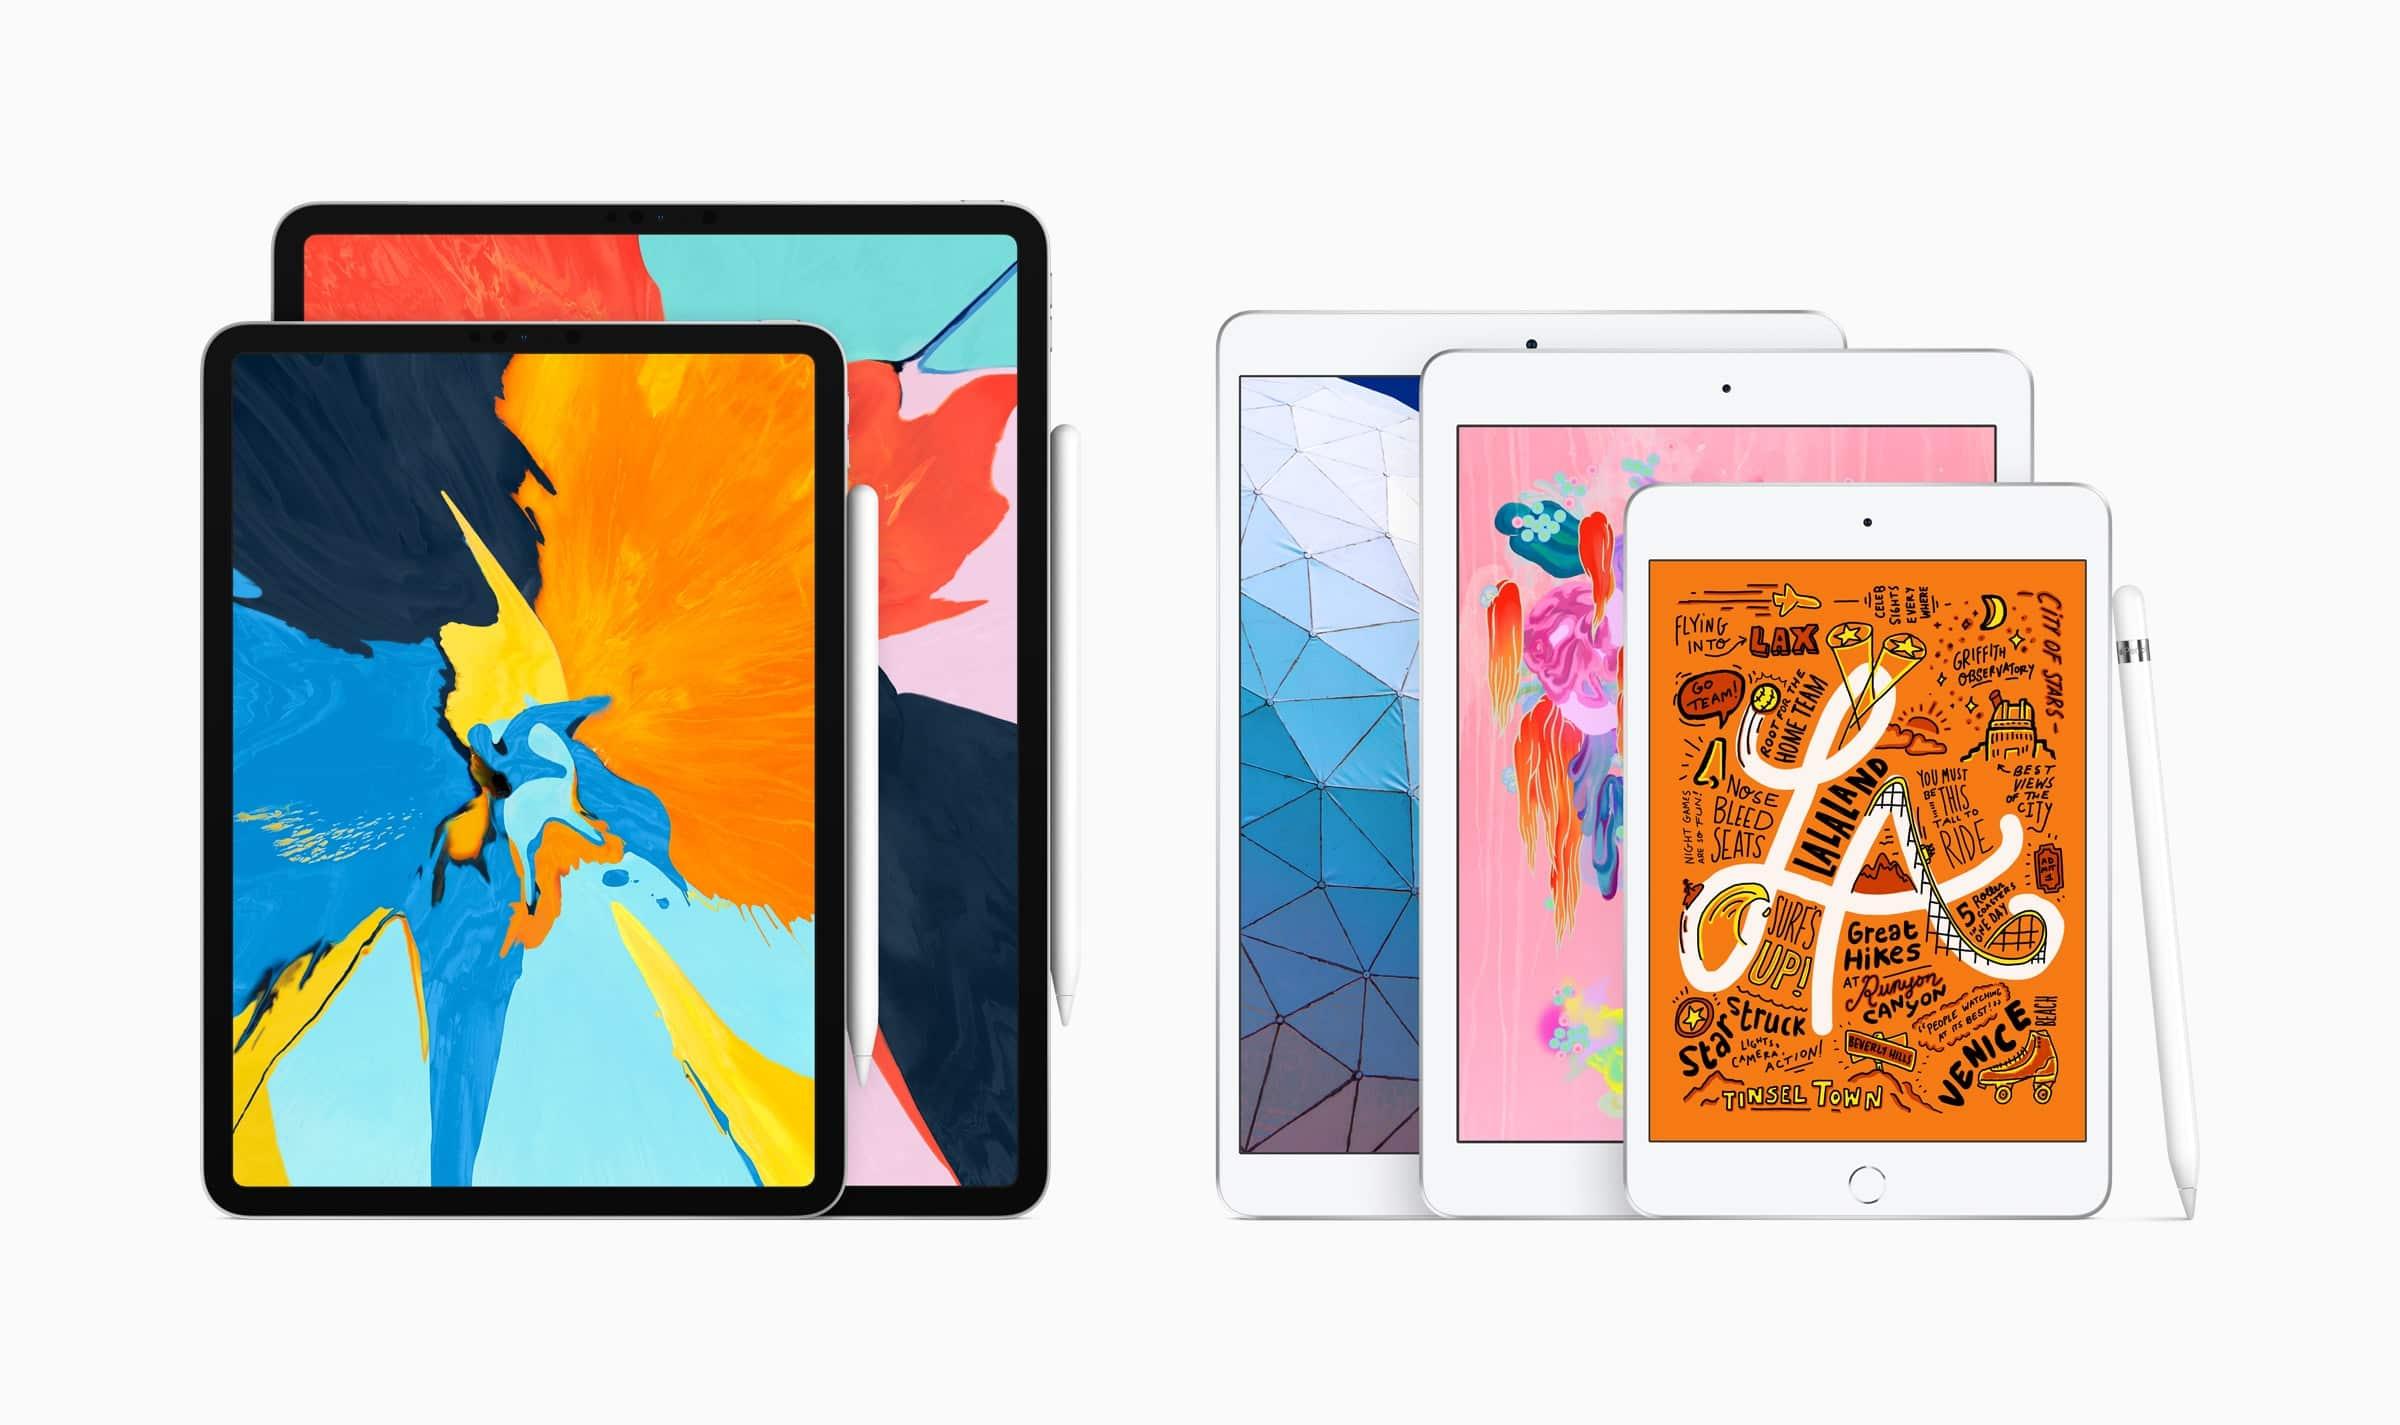 Nova linha de iPads Pro, iPad Air, iPad e iPad mini